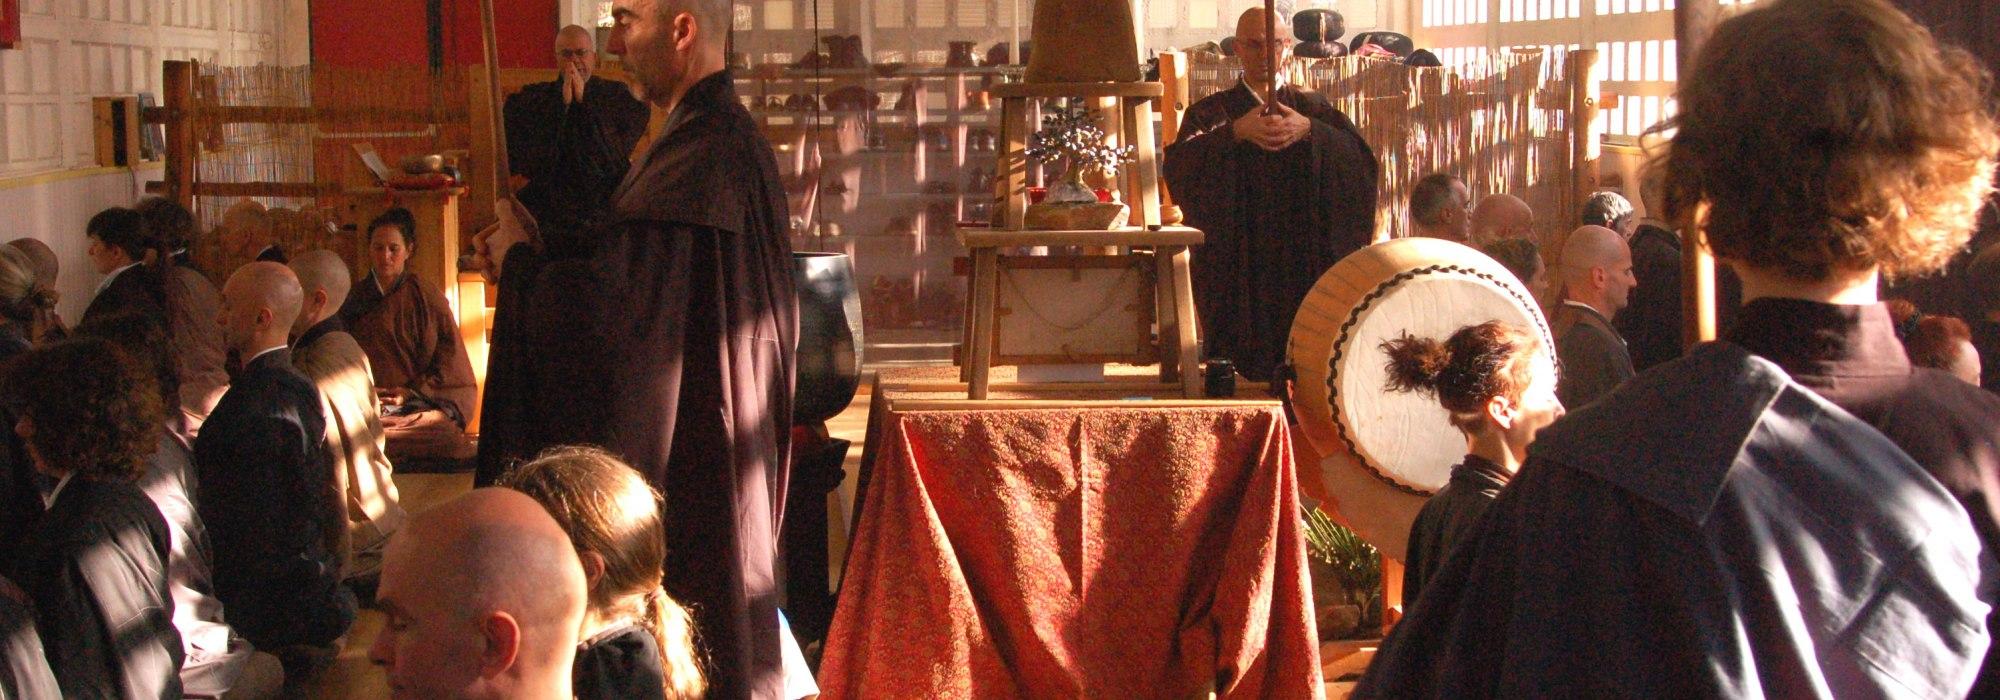 Quoi de neuf au temple zen du Caroux ?  : Actualités du temple zen Yujo Nyusanji